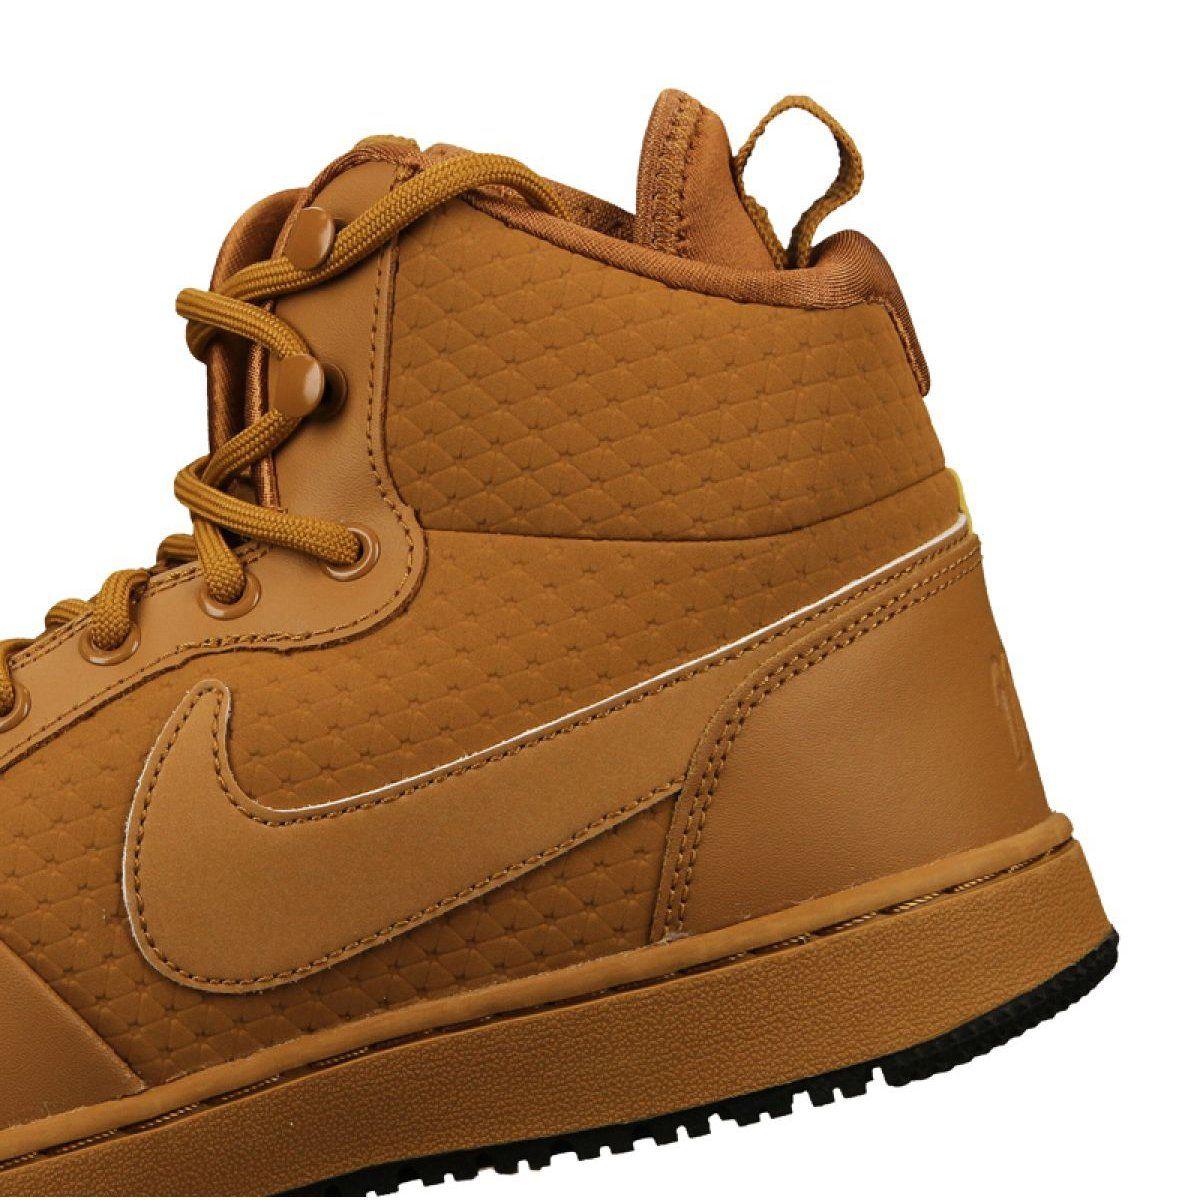 Nike Ebernon Mid Winter M AQ8754-700